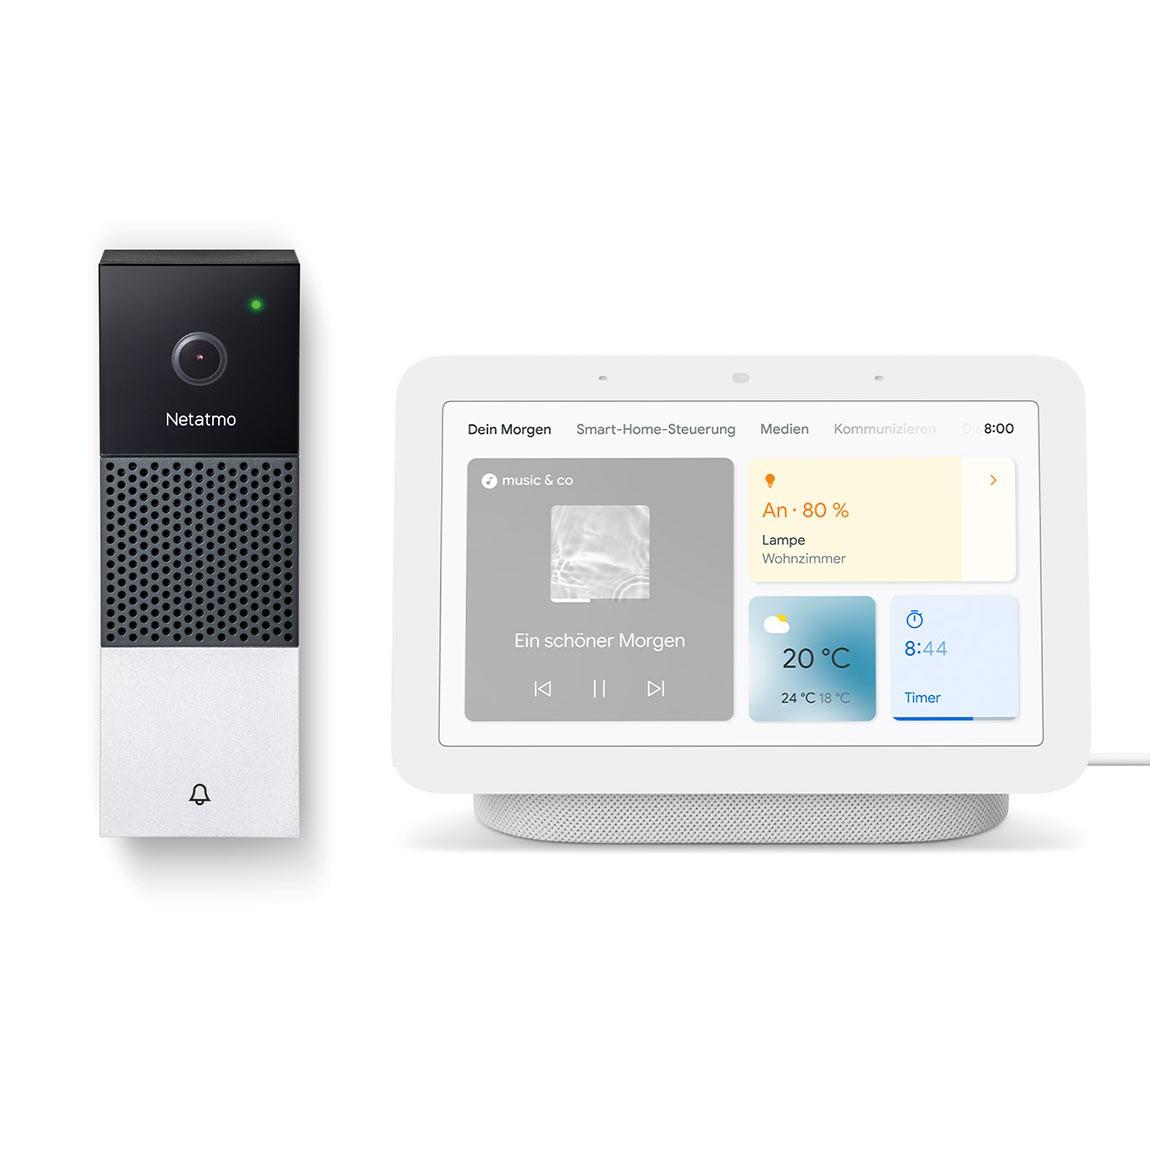 Bundle - Netatmo Smarte Videotürklingel Doorbell + Google Nest Hub (2. Generation)